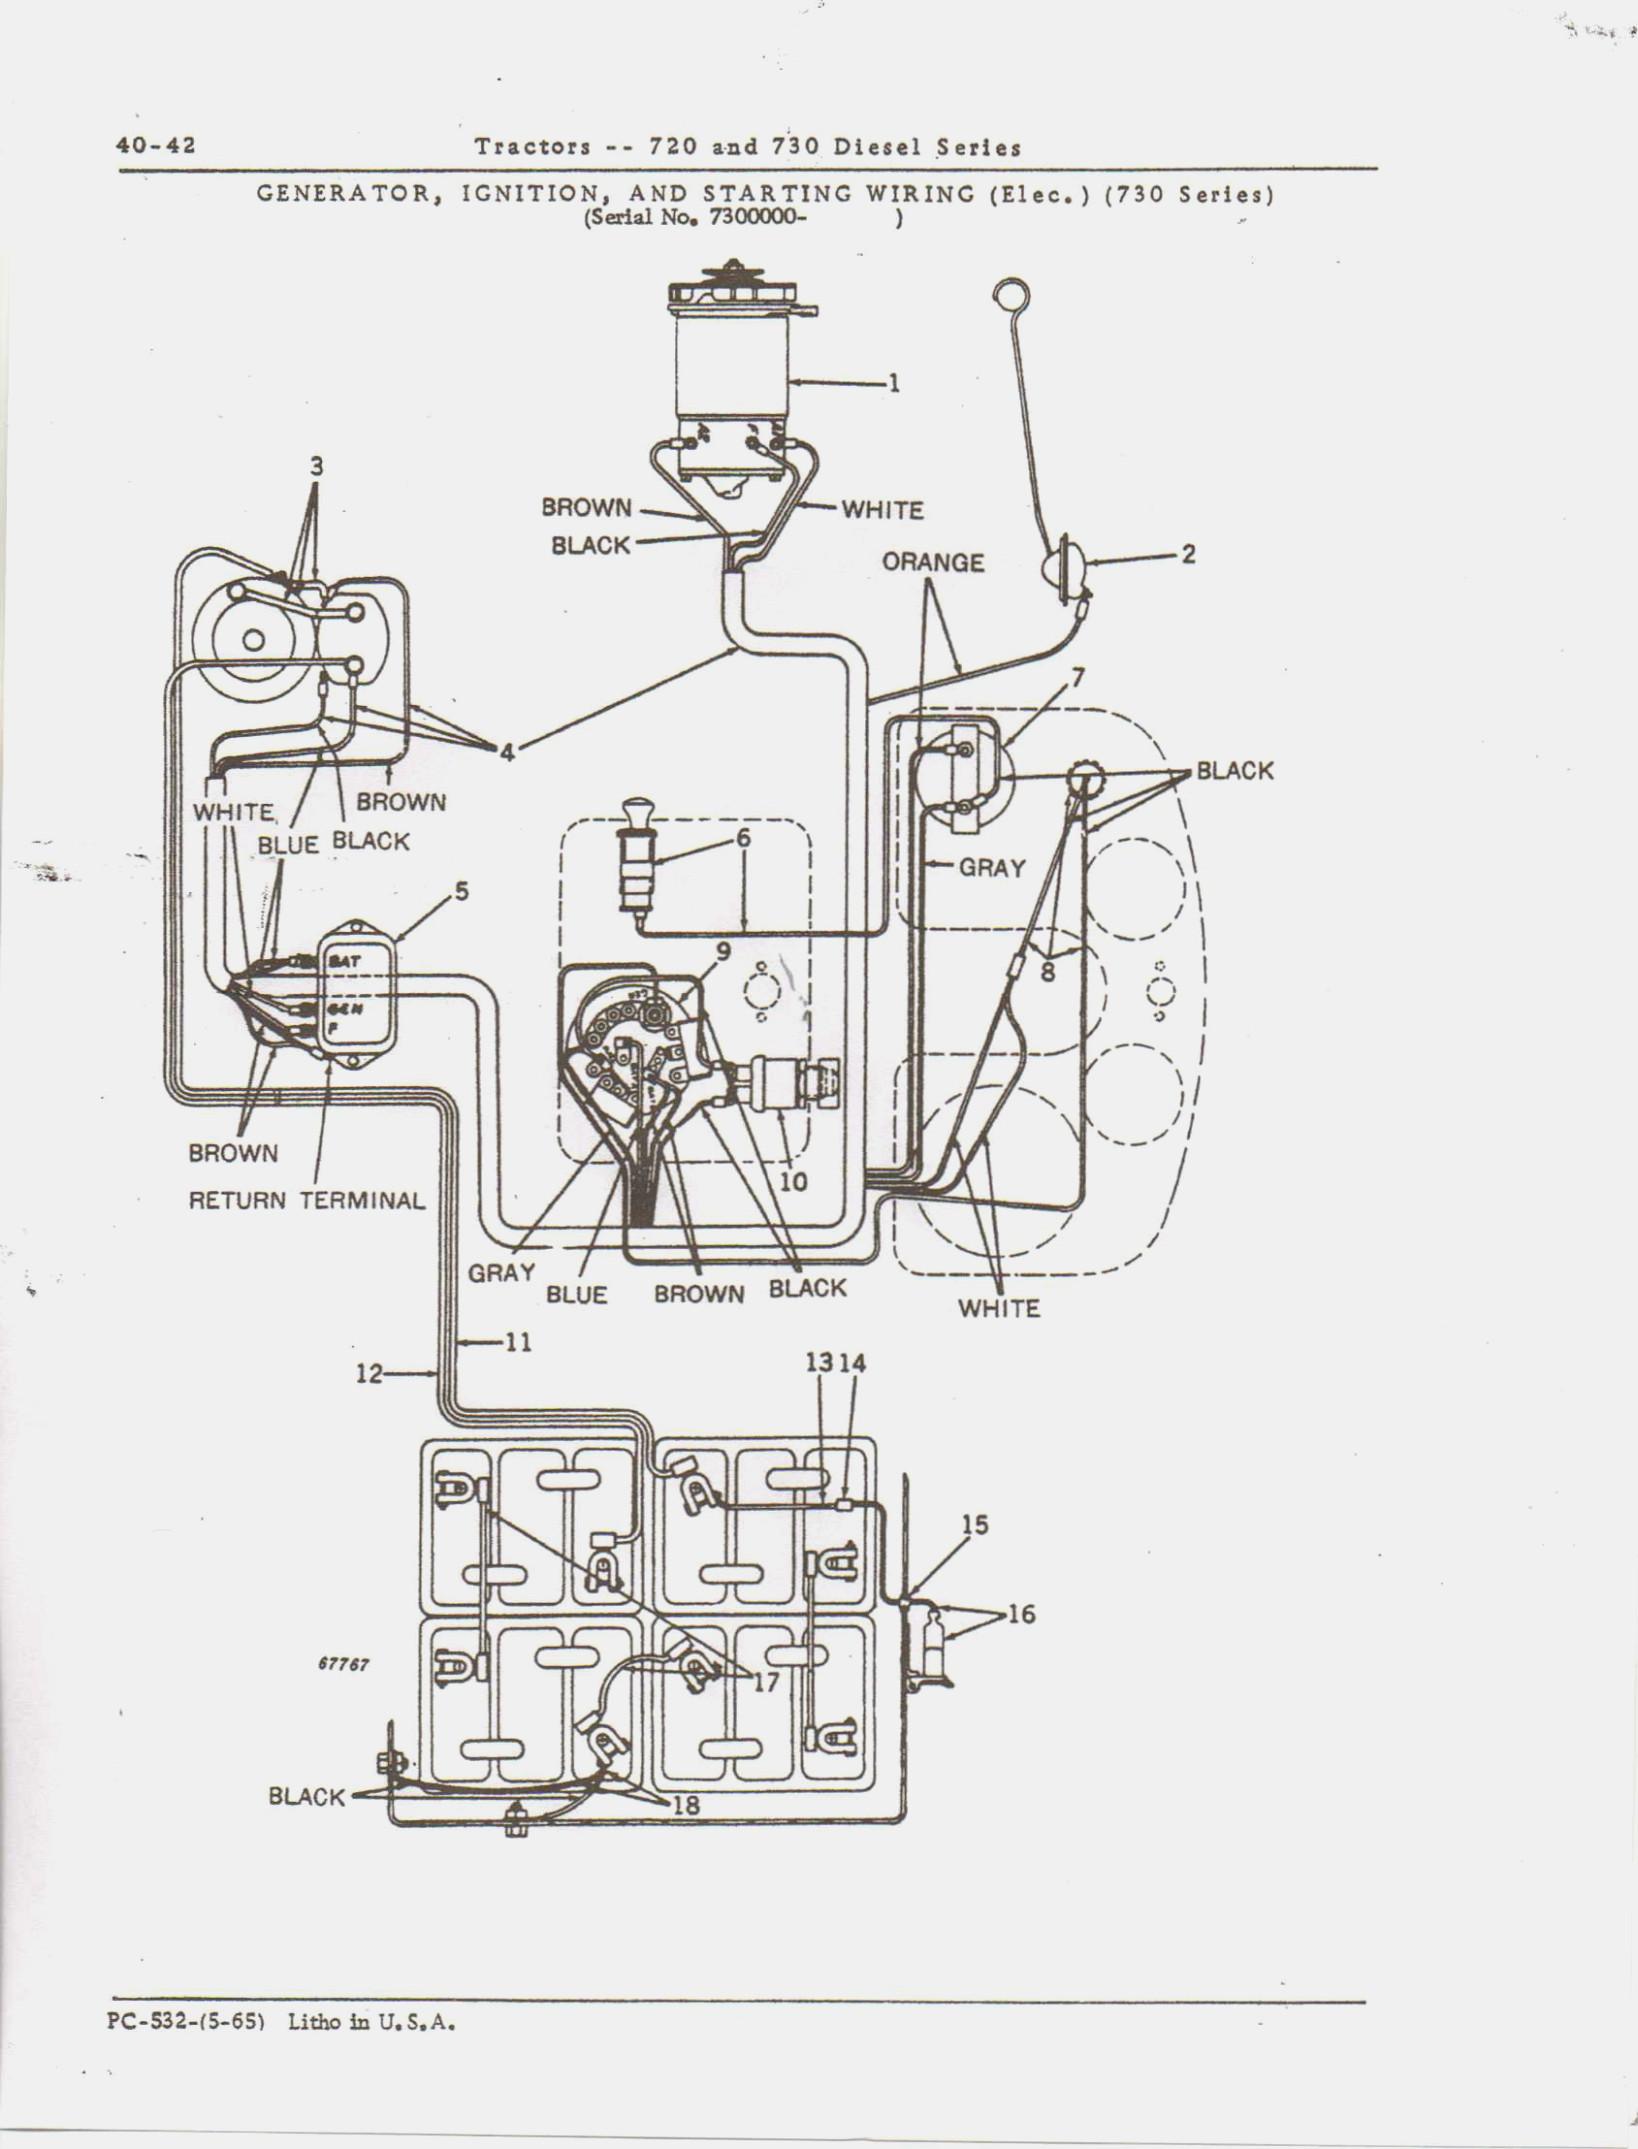 john deere 60 tractor wiring diagram john deere 850 wiring diagram wiring diagram data  john deere 850 wiring diagram wiring